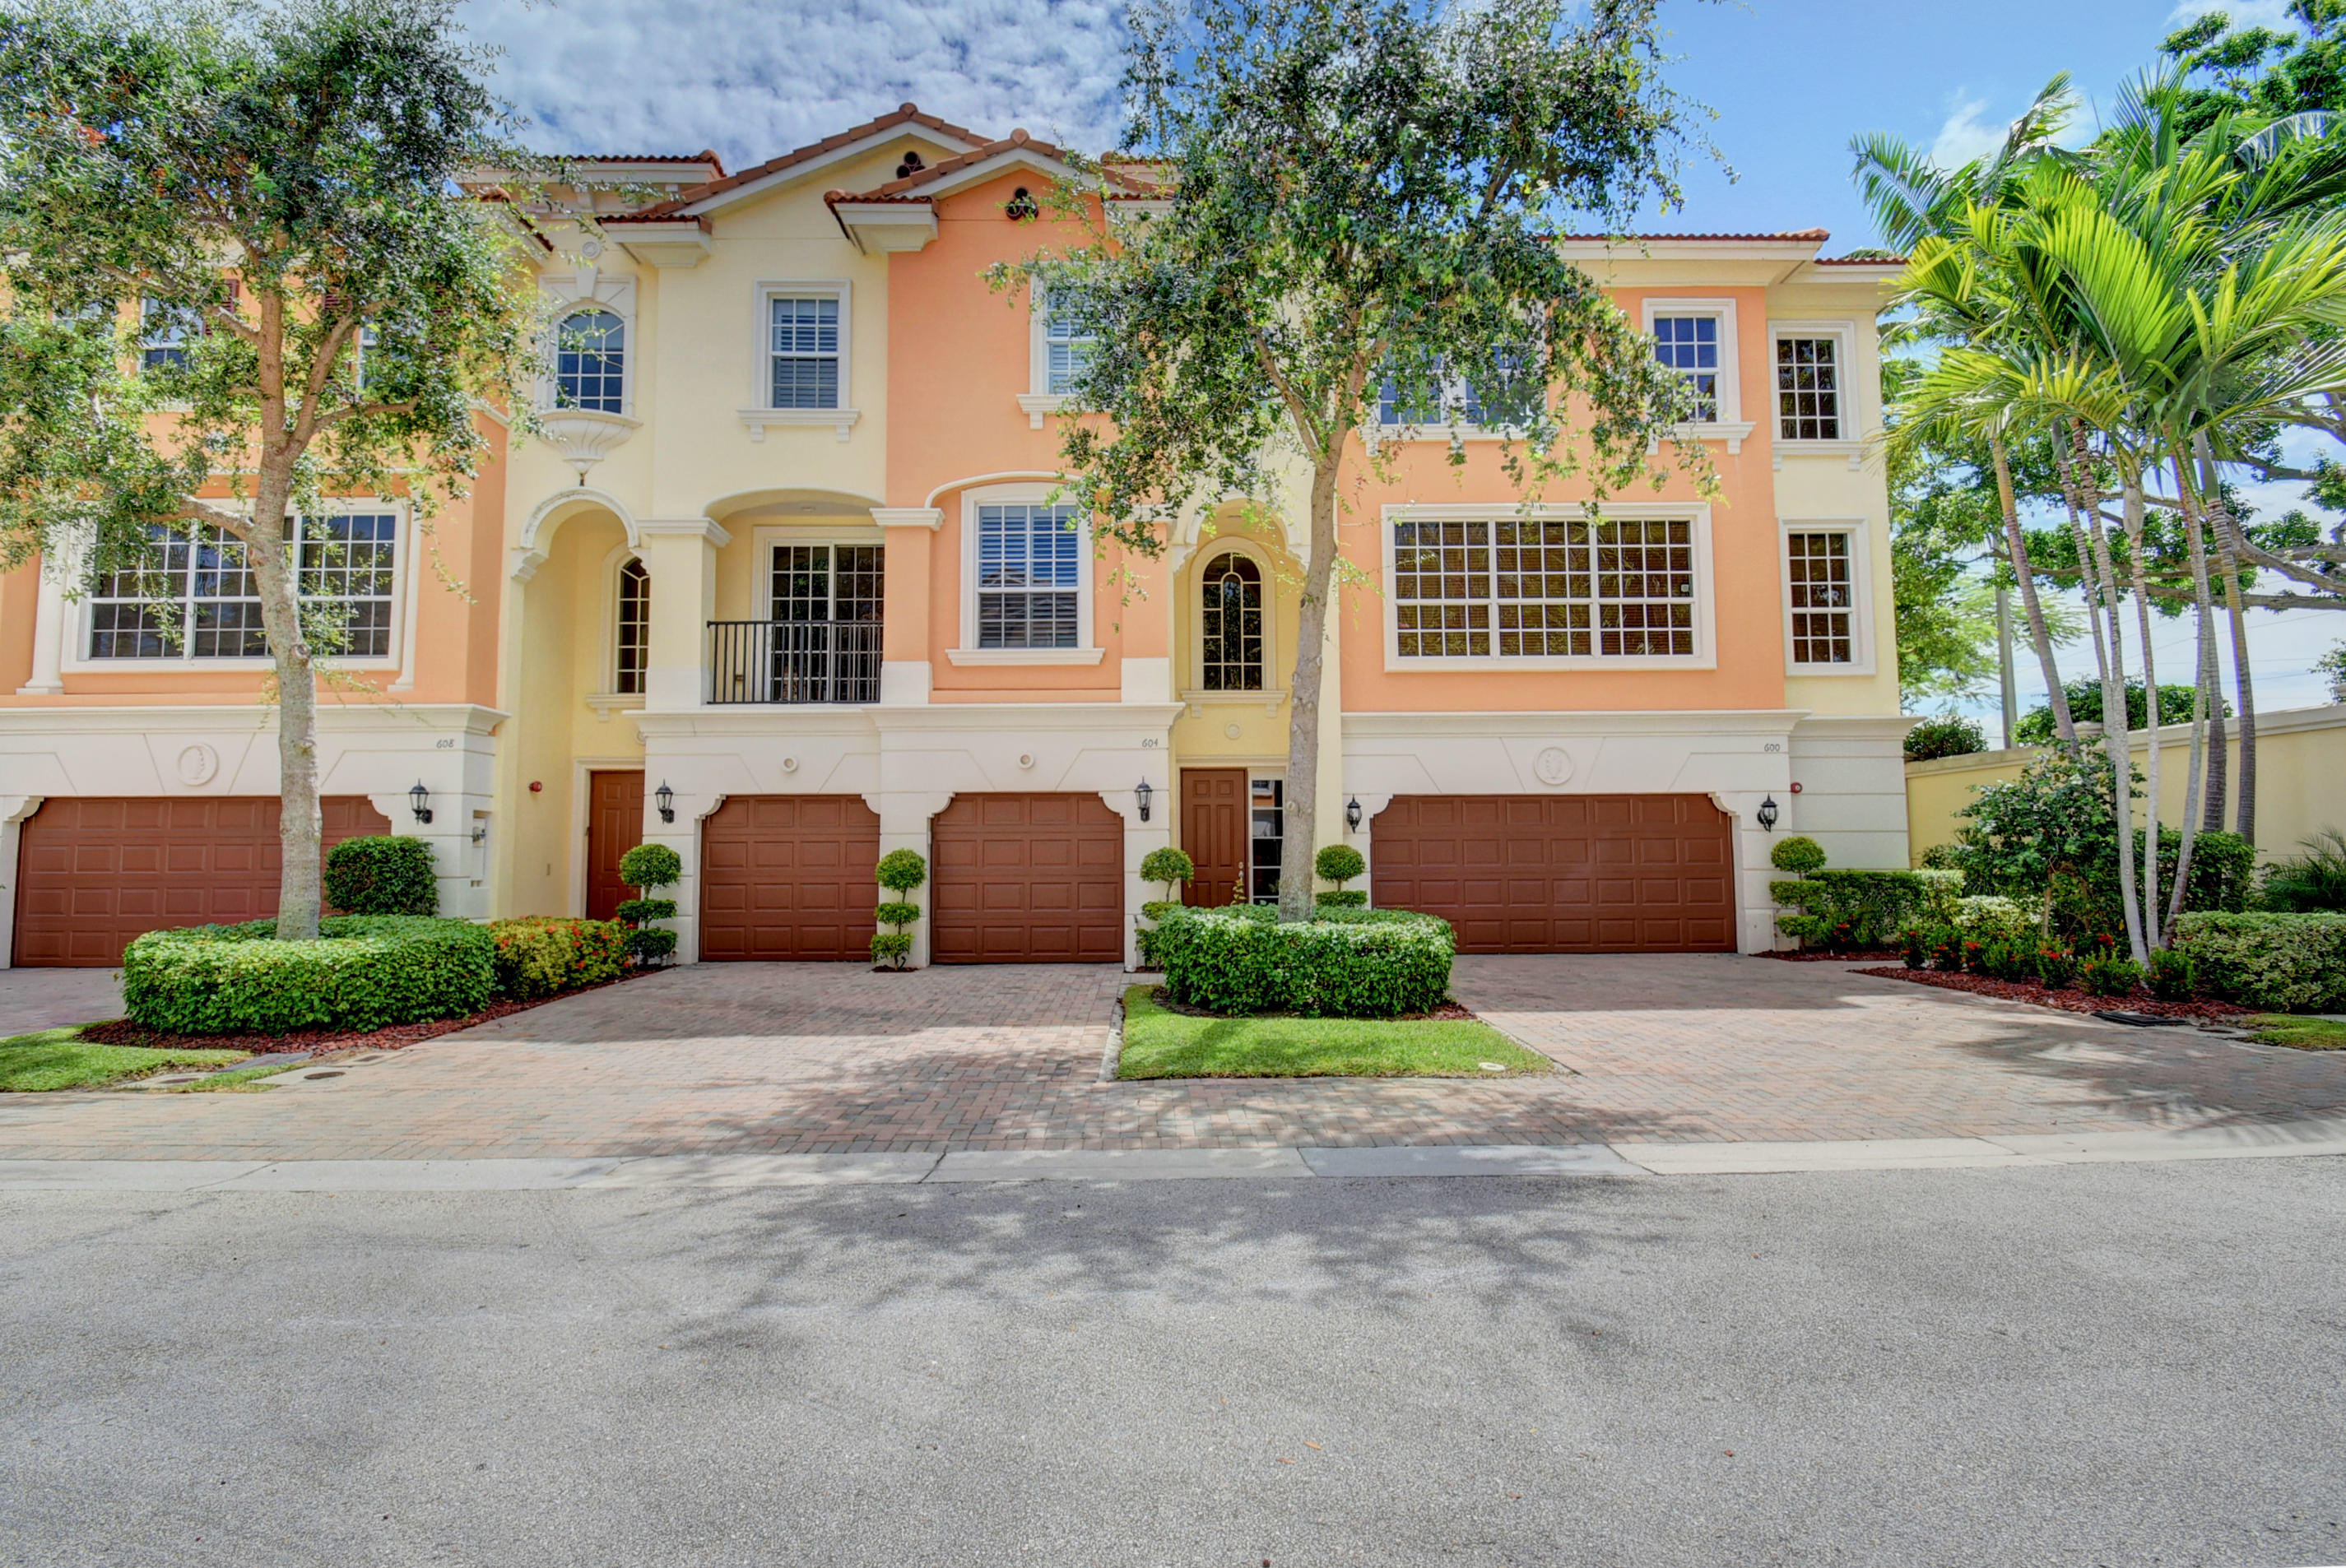 604 Ne Francesca Lane Boca Raton, FL 33487